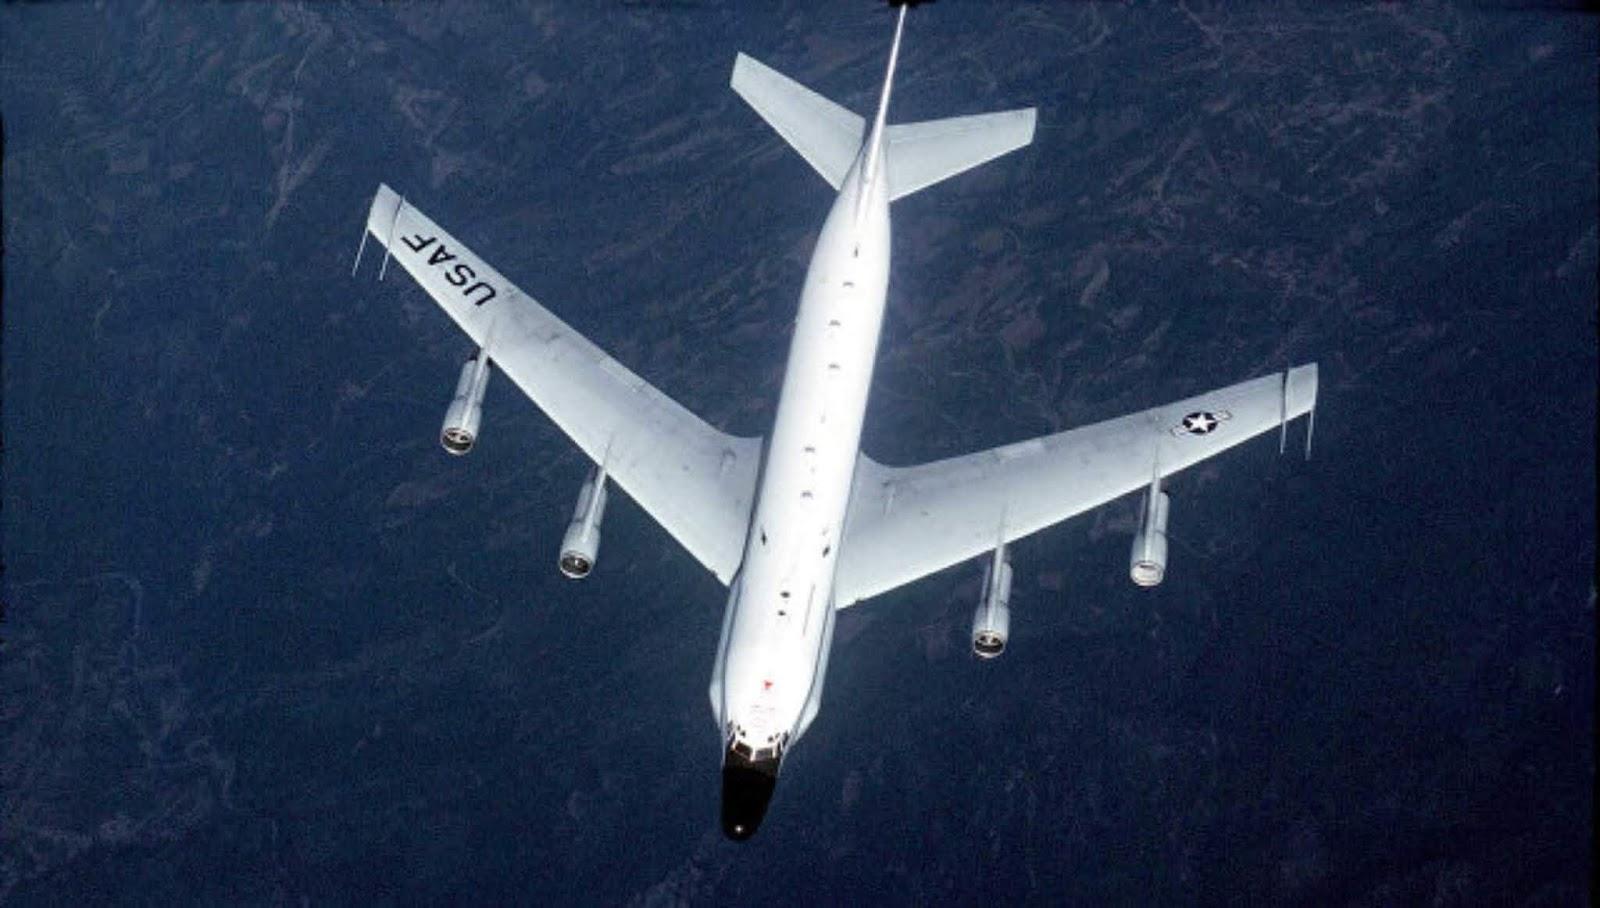 Pesawat pengintai Amerika melihat dekat perbatasan wilayah Kaliningrad